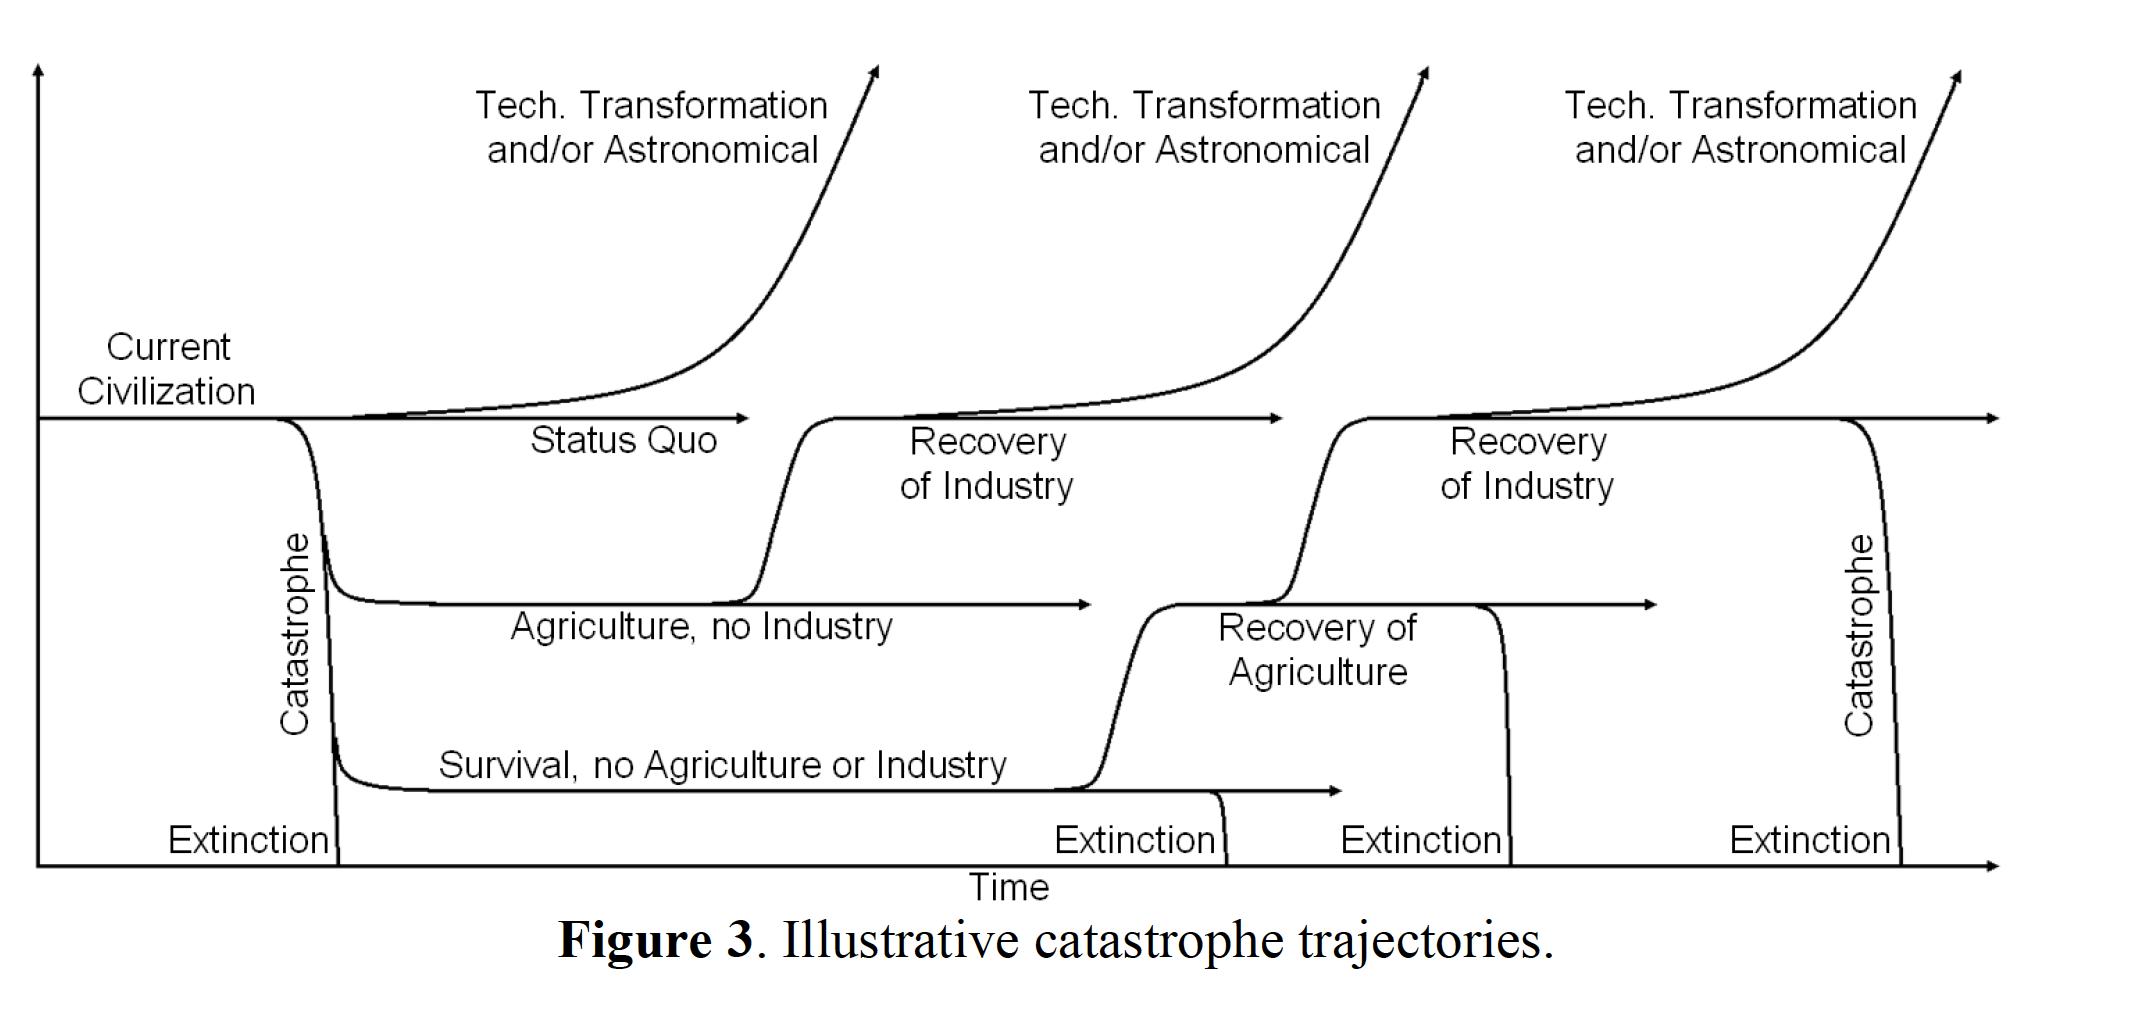 From Baum et al. (2018). Long Term Trajectories of Human Civilization. Foresight. DOI 10.1108/FS-04-2018-0037